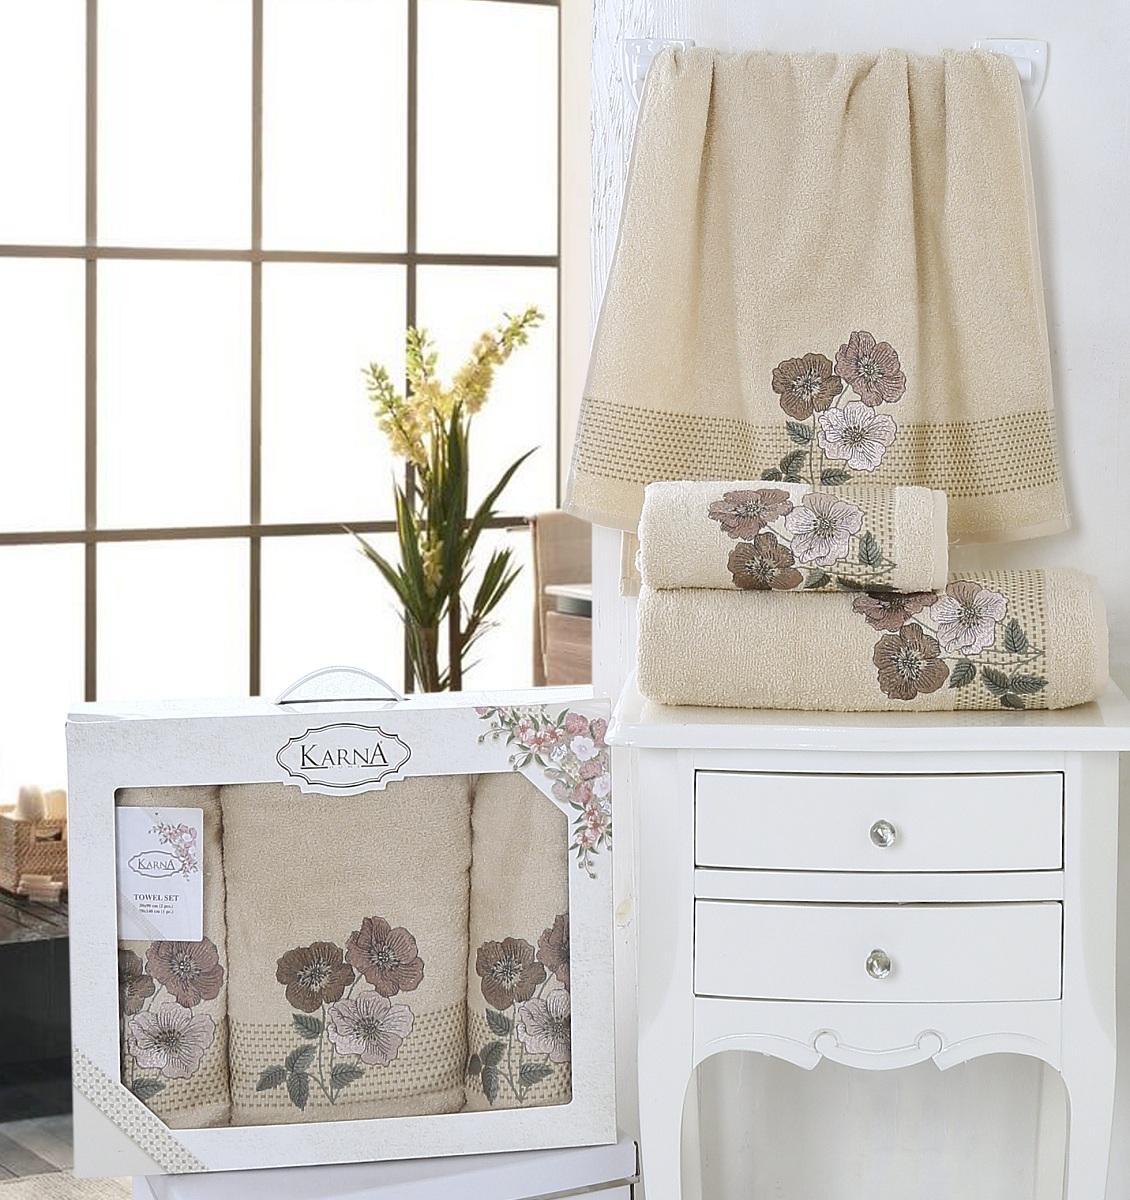 Купить Полотенца Karna, Полотенце Sandy Цвет: Бежевый (Набор), Турция, Махра